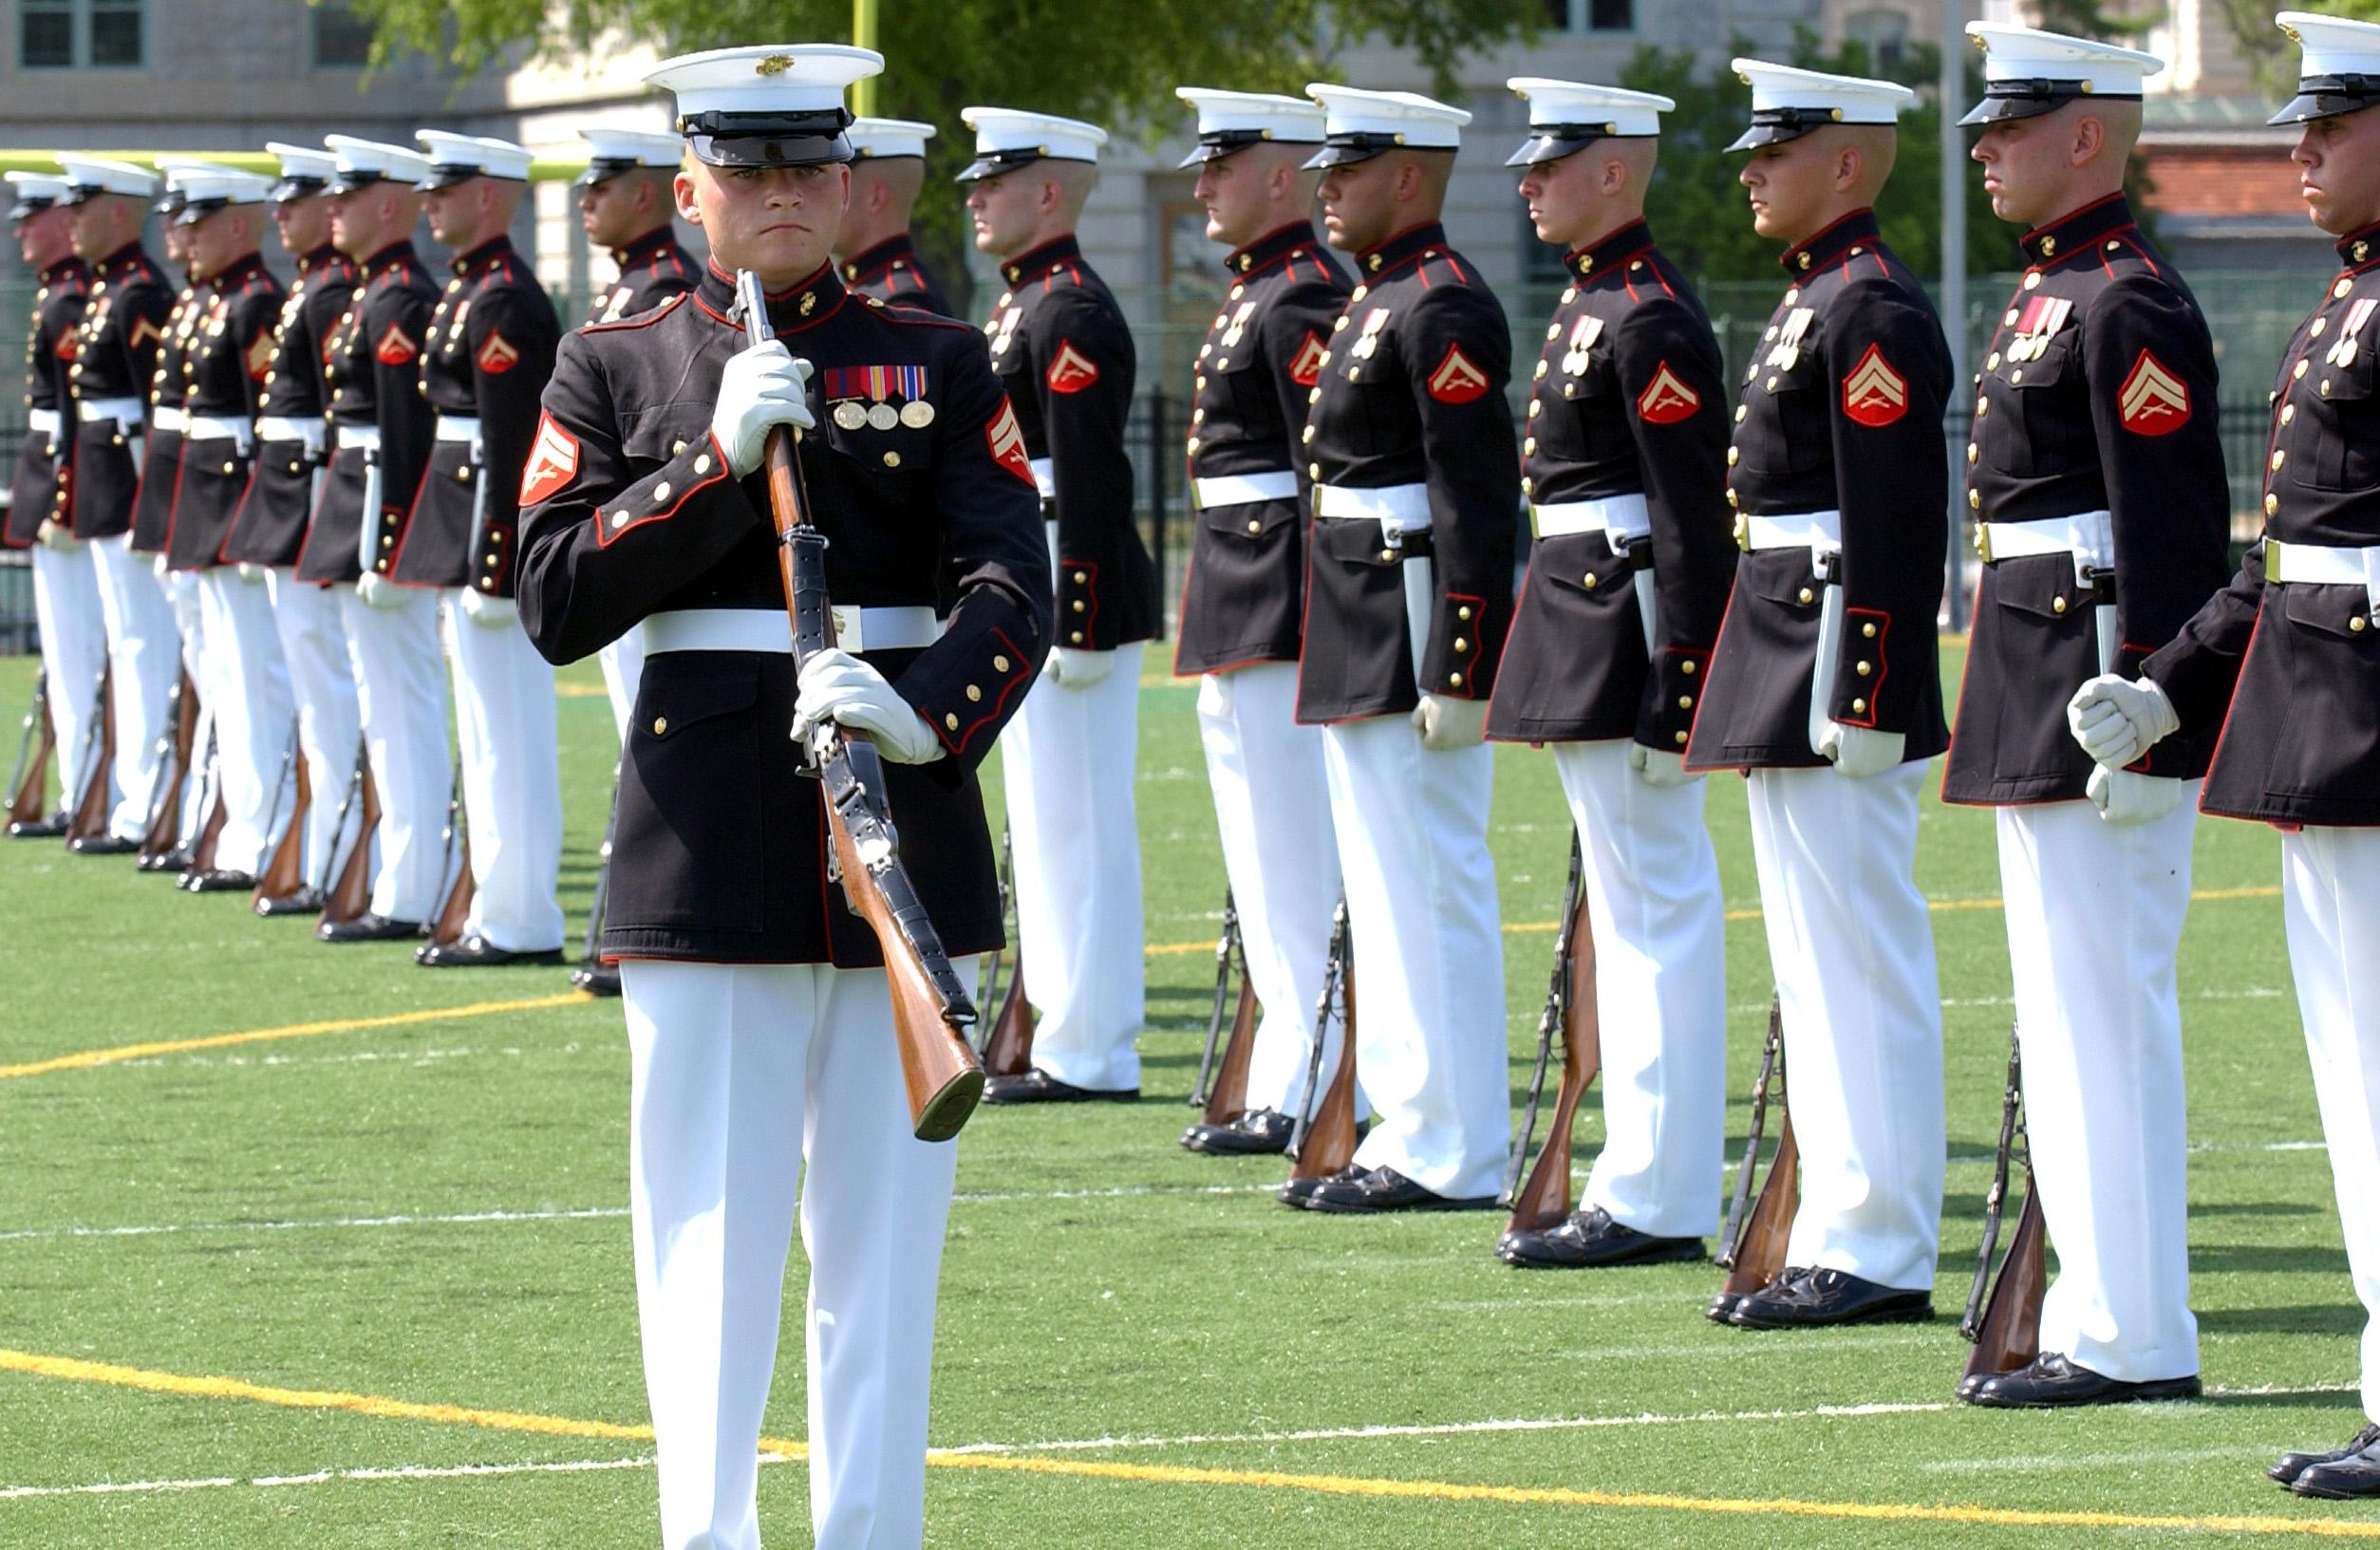 United States Marine Corps Drill Team